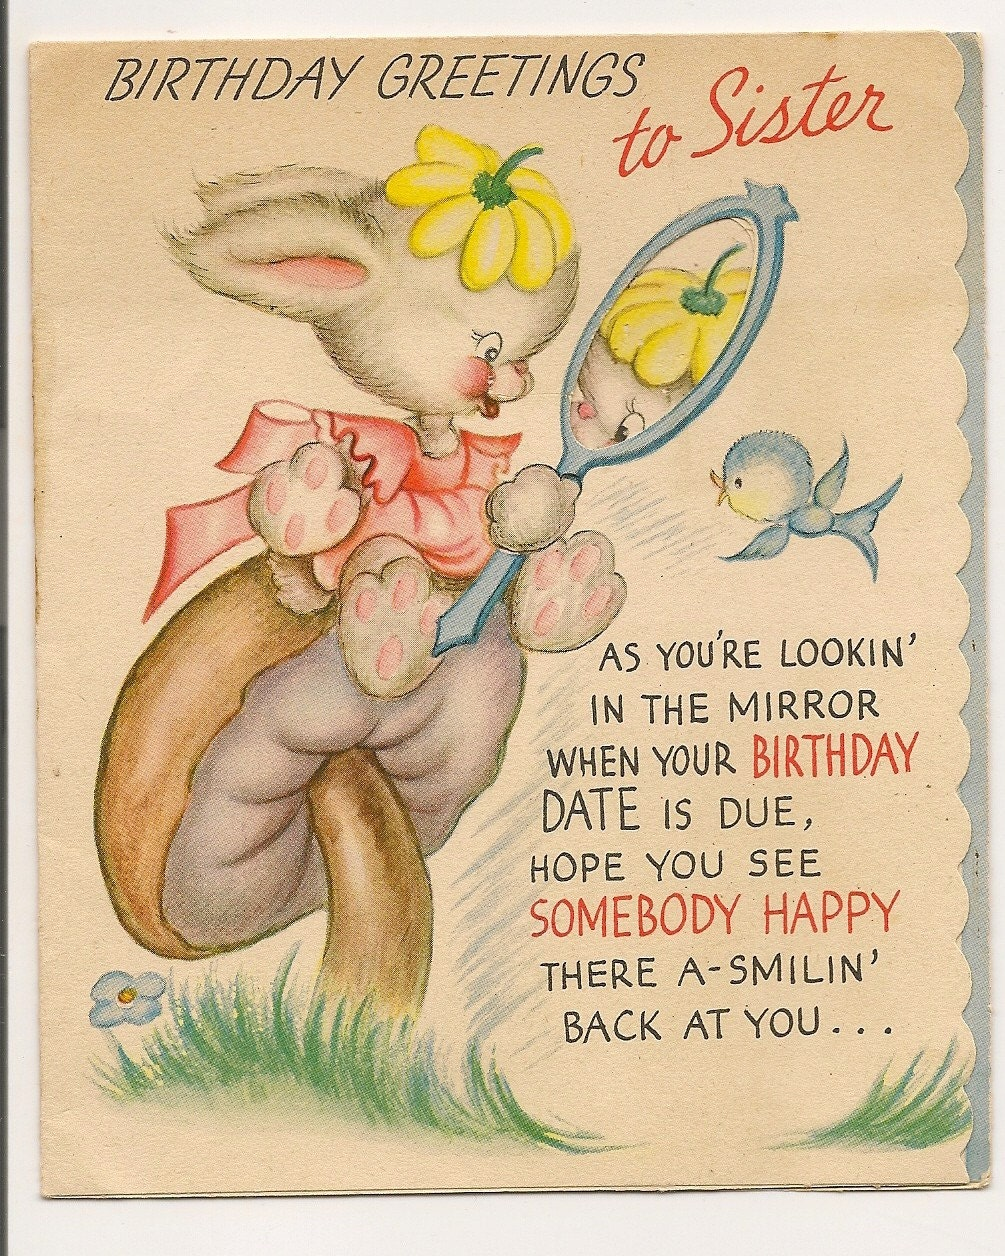 Vintage Birthday Wishes For Sister ~ Vintage birthday greetings card to sister by myramelinda on etsy